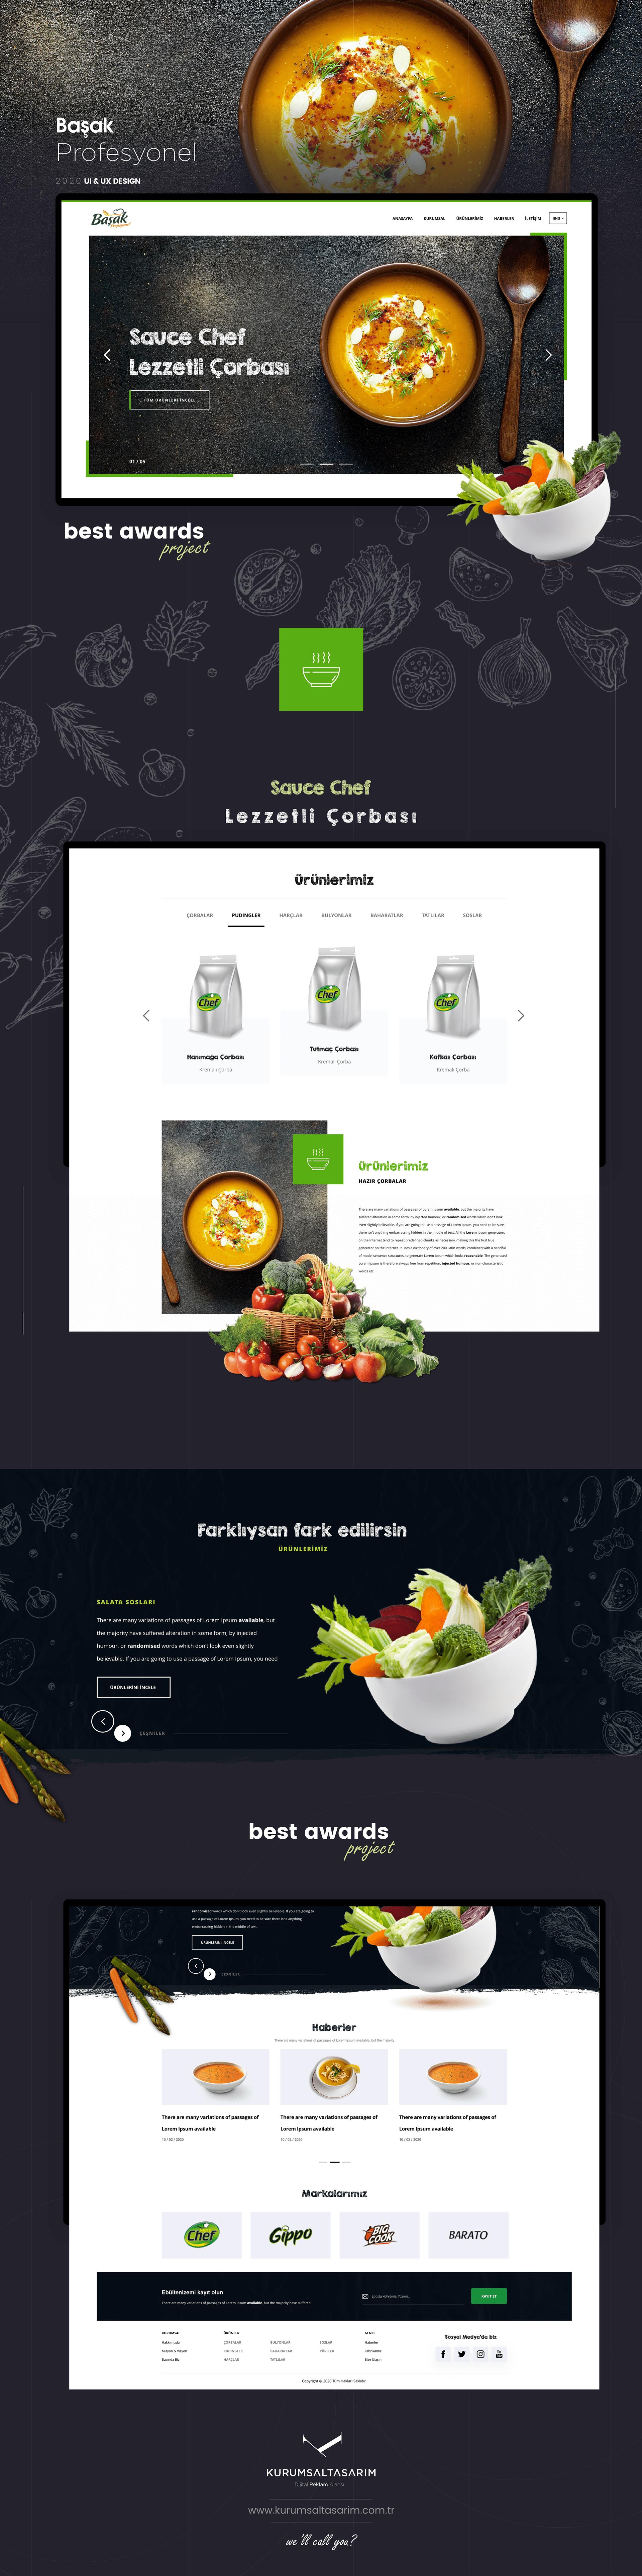 Şef, Restoran, Cafe kurumsal web tasarimi